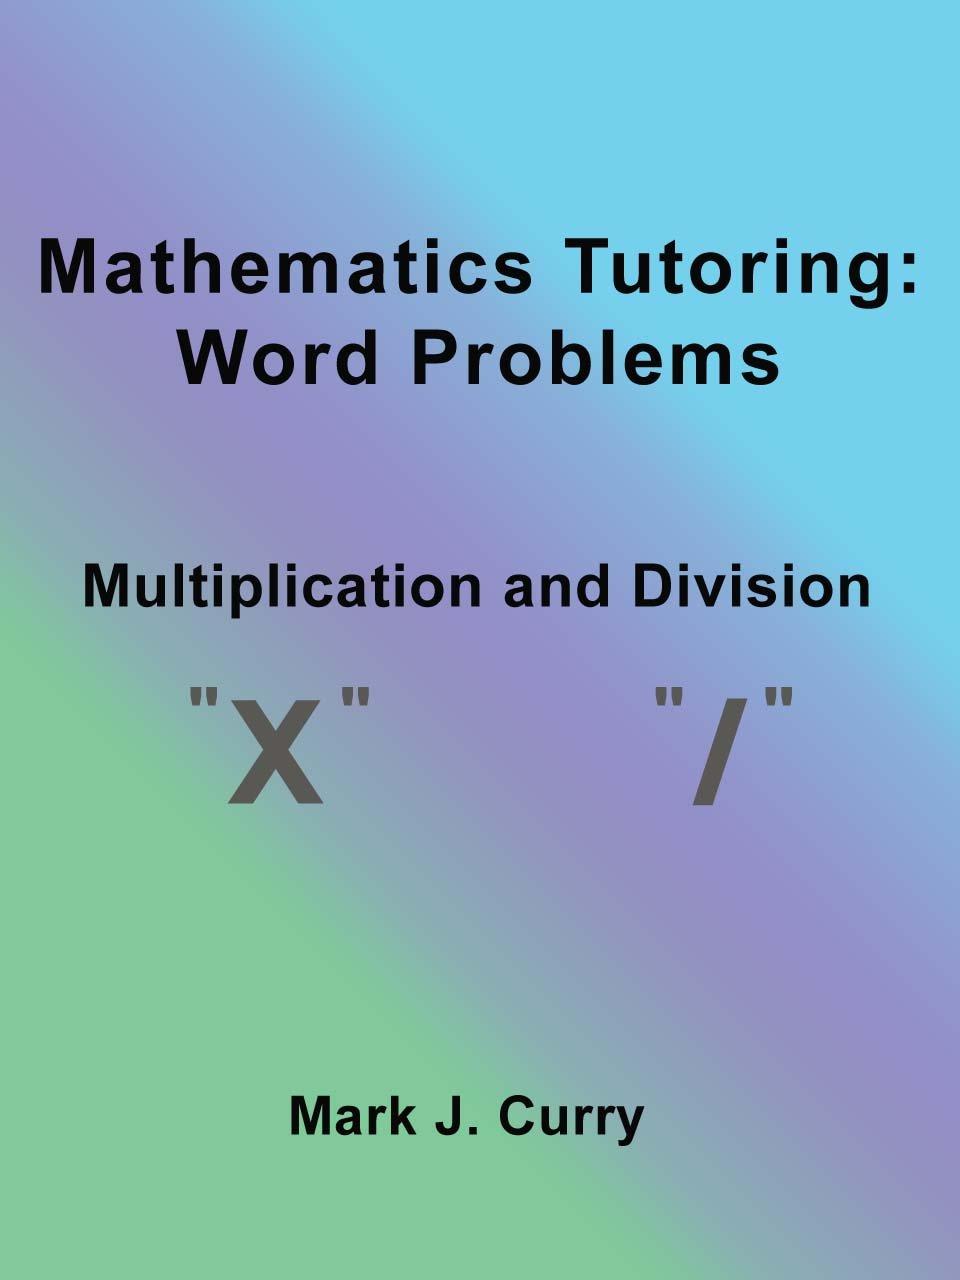 Amazon.com: Mathematics Tutoring: Word Problems - Multiplication and ...